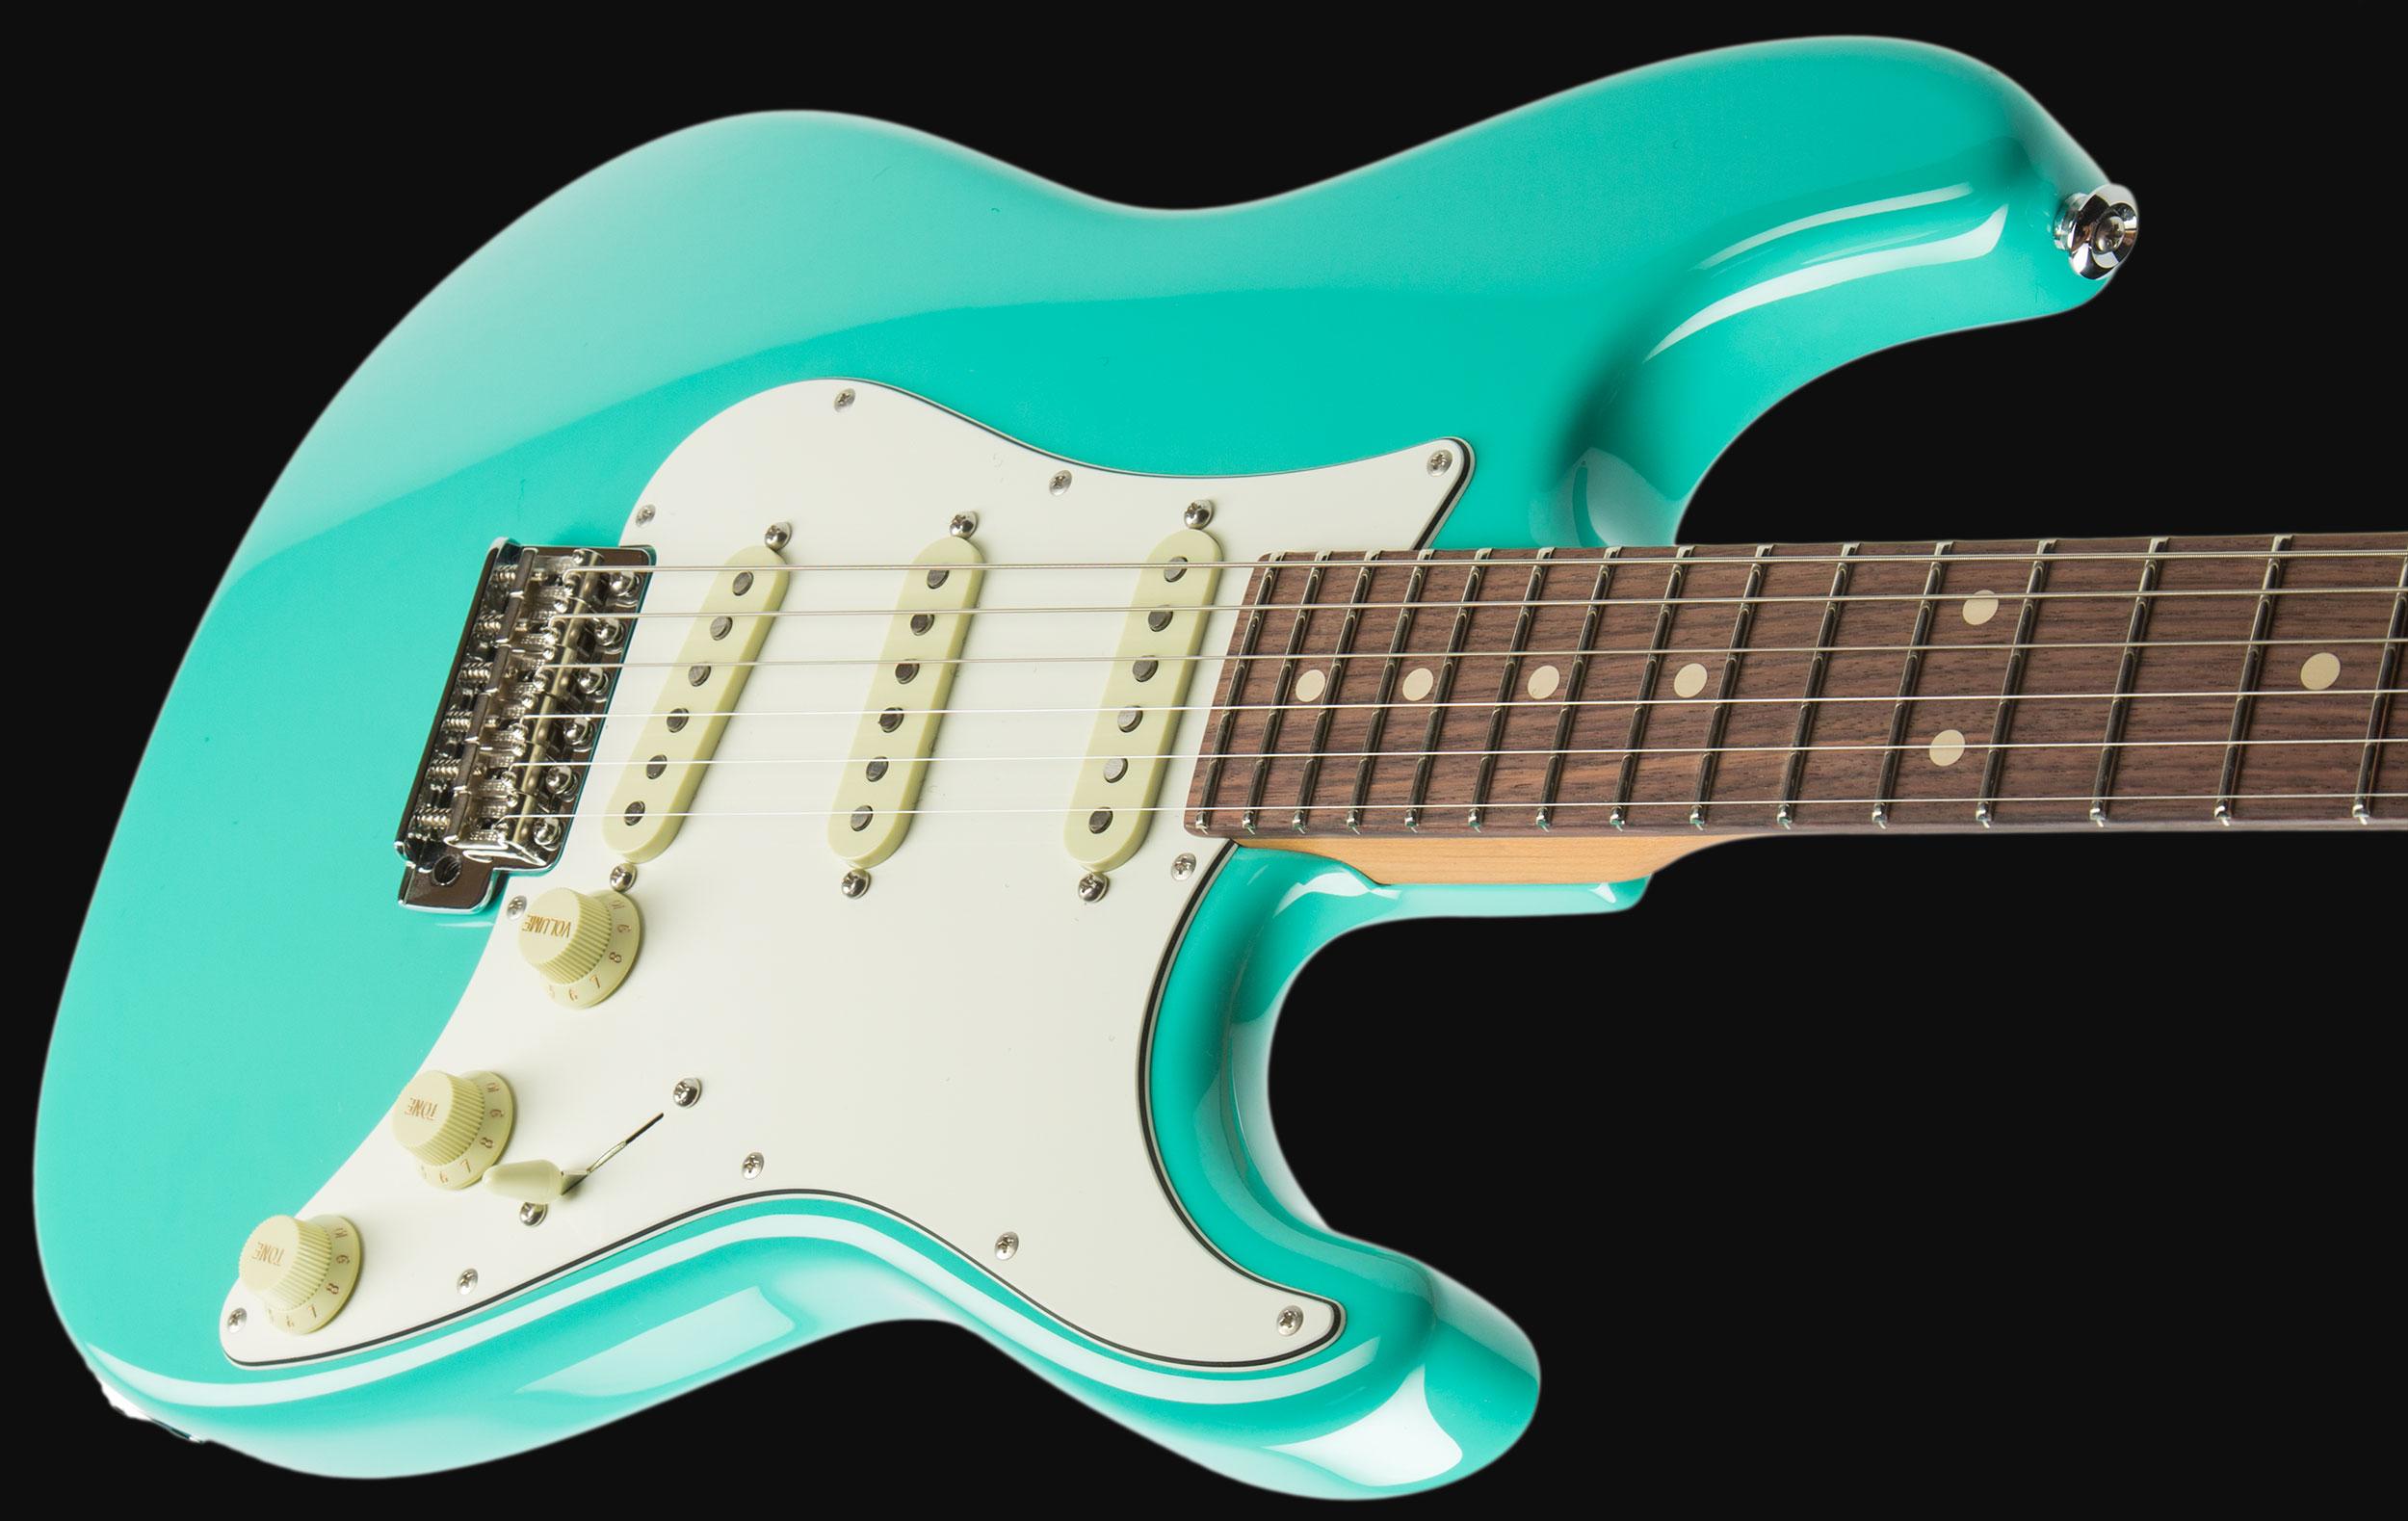 Scott Henderson Over 800 Fender Guitar Amps Wiring Schematics Manuals For Sale 32059 010